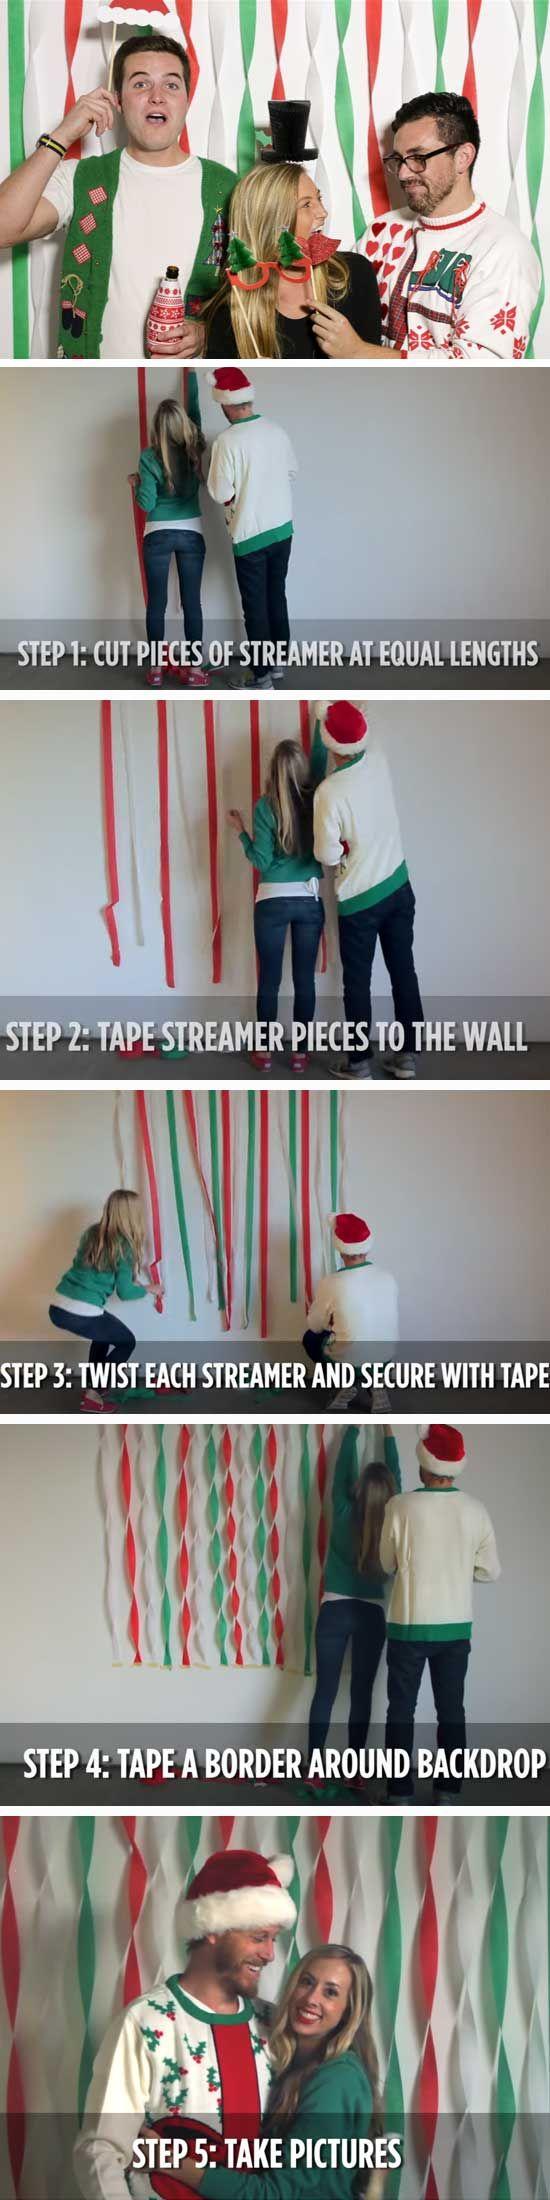 Fun Adult Christmas Party Ideas Part - 22: Festive Photobooth | 20 DIY Christmas Party Ideas For Adults | Beauty Hacks  | Pinterest | DIY Christmas And Holidays